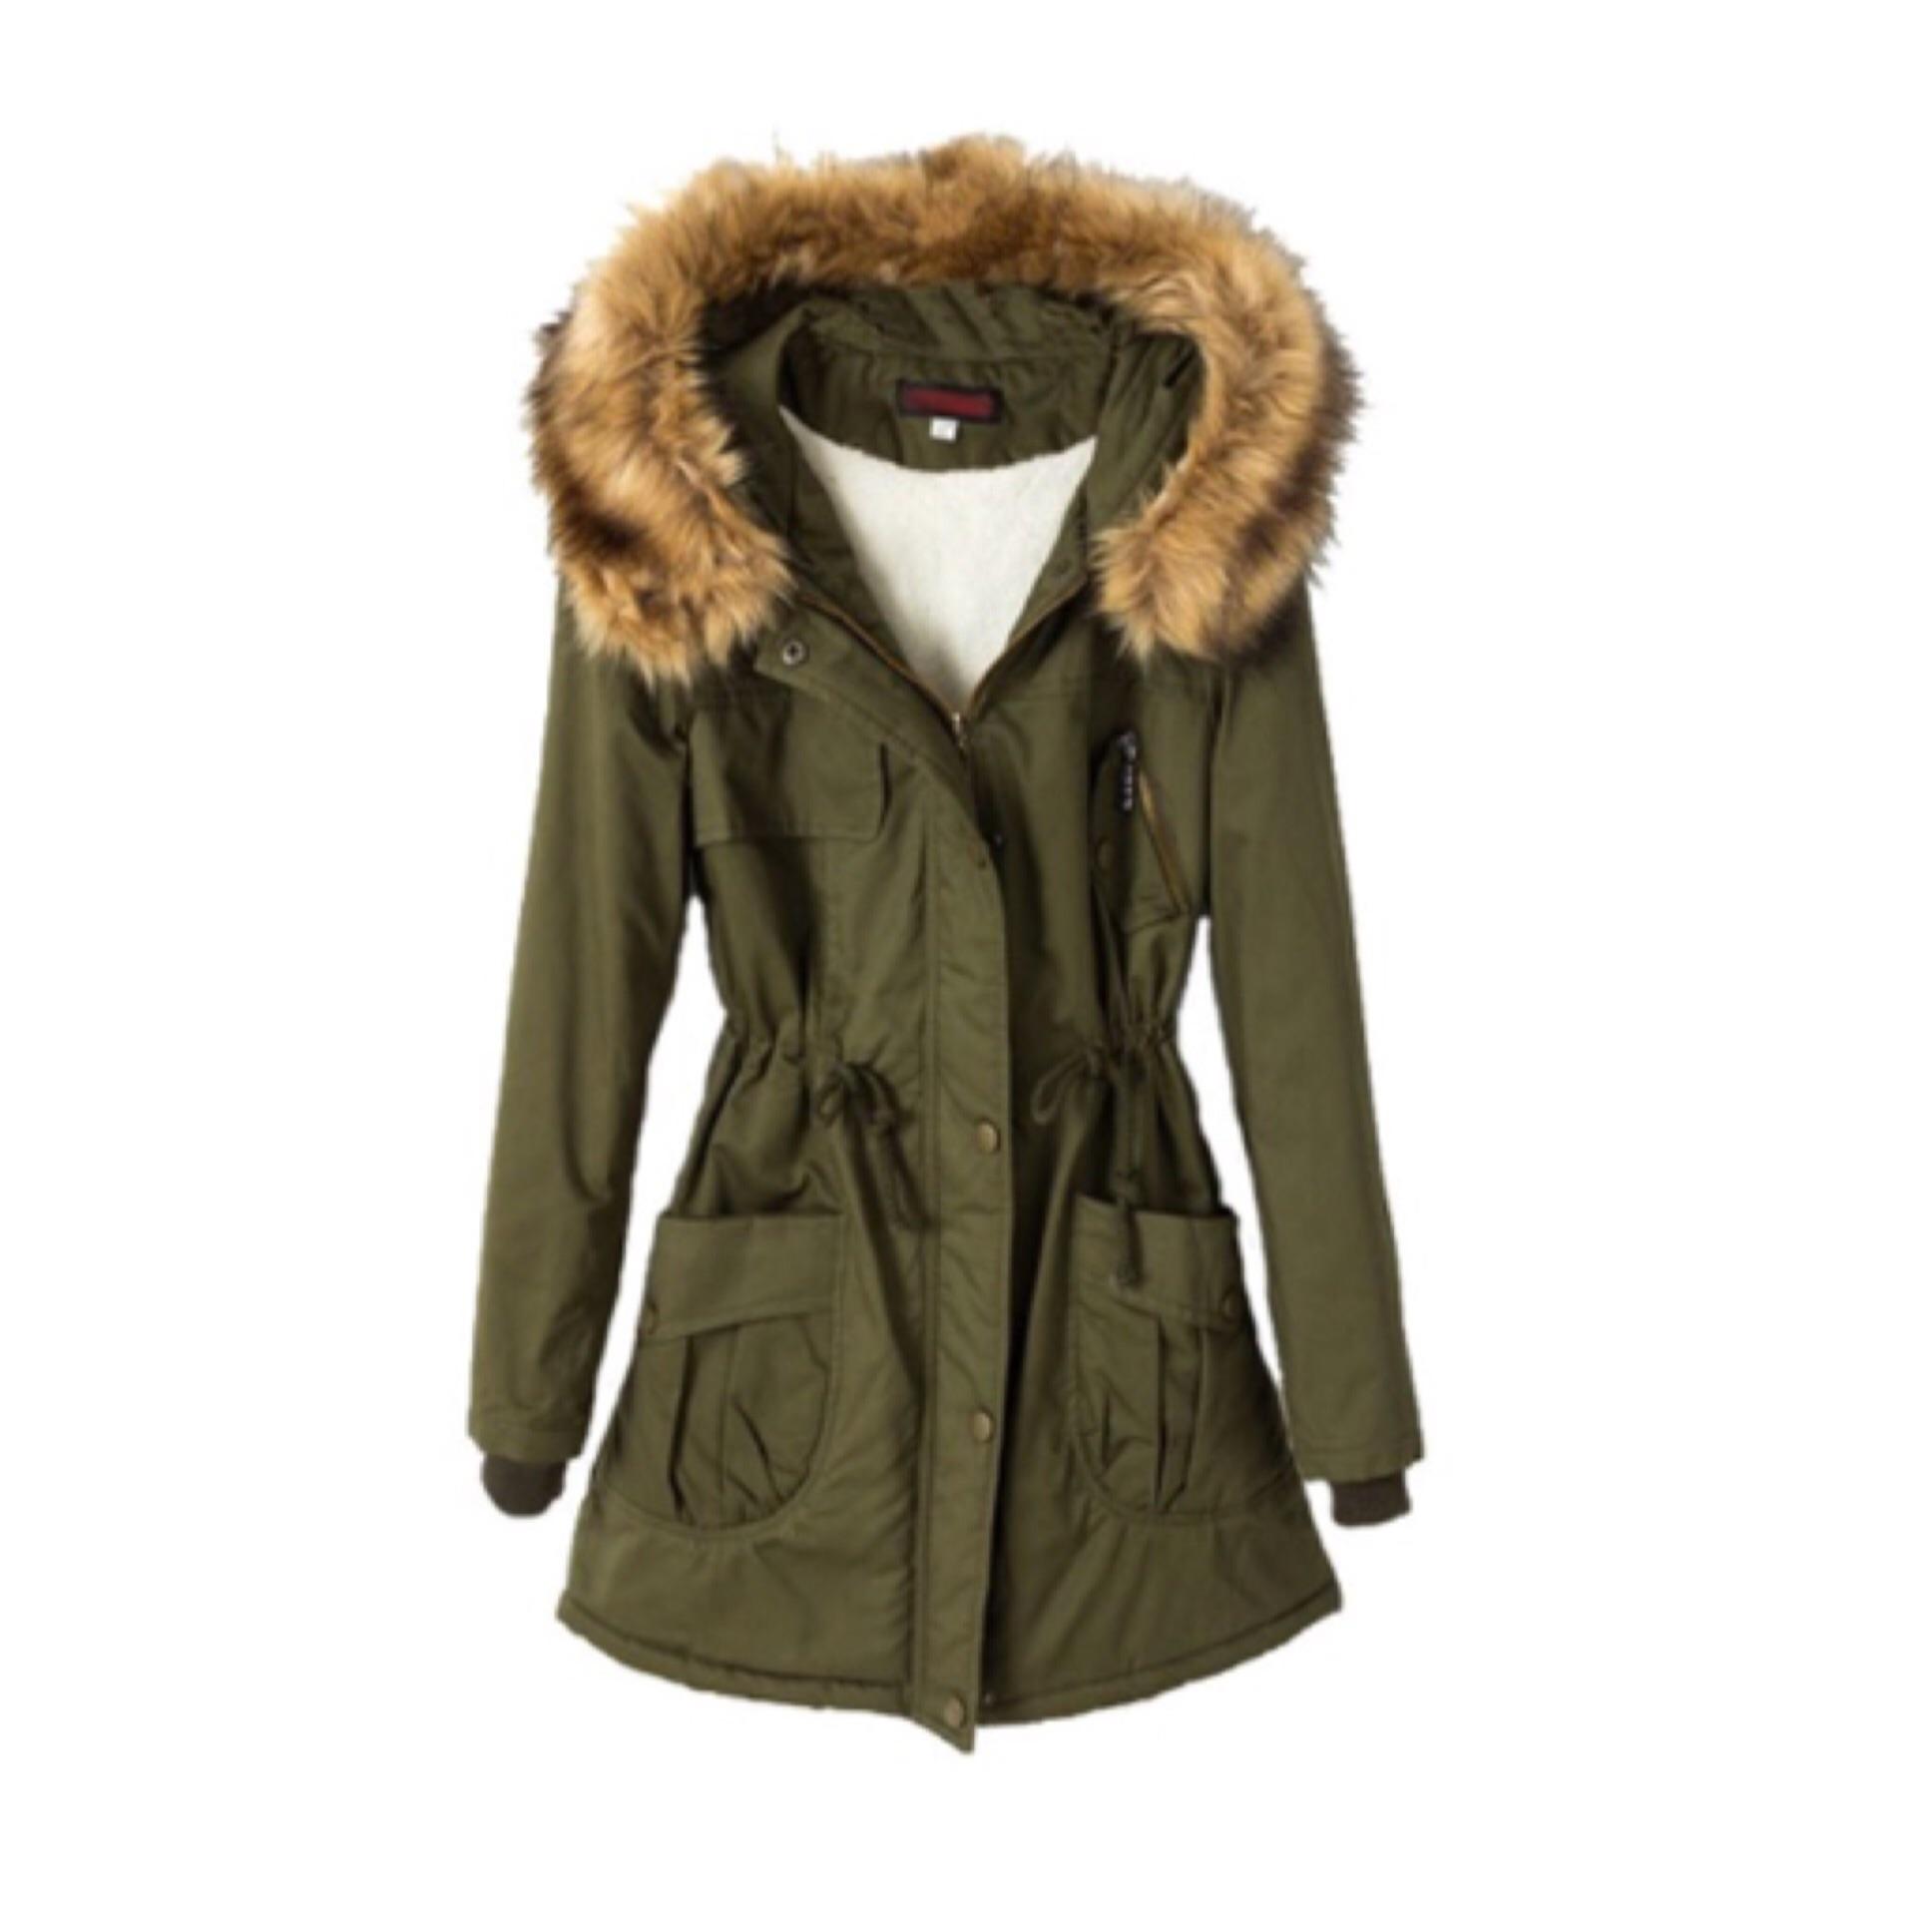 Army green fur hooded parka jacket